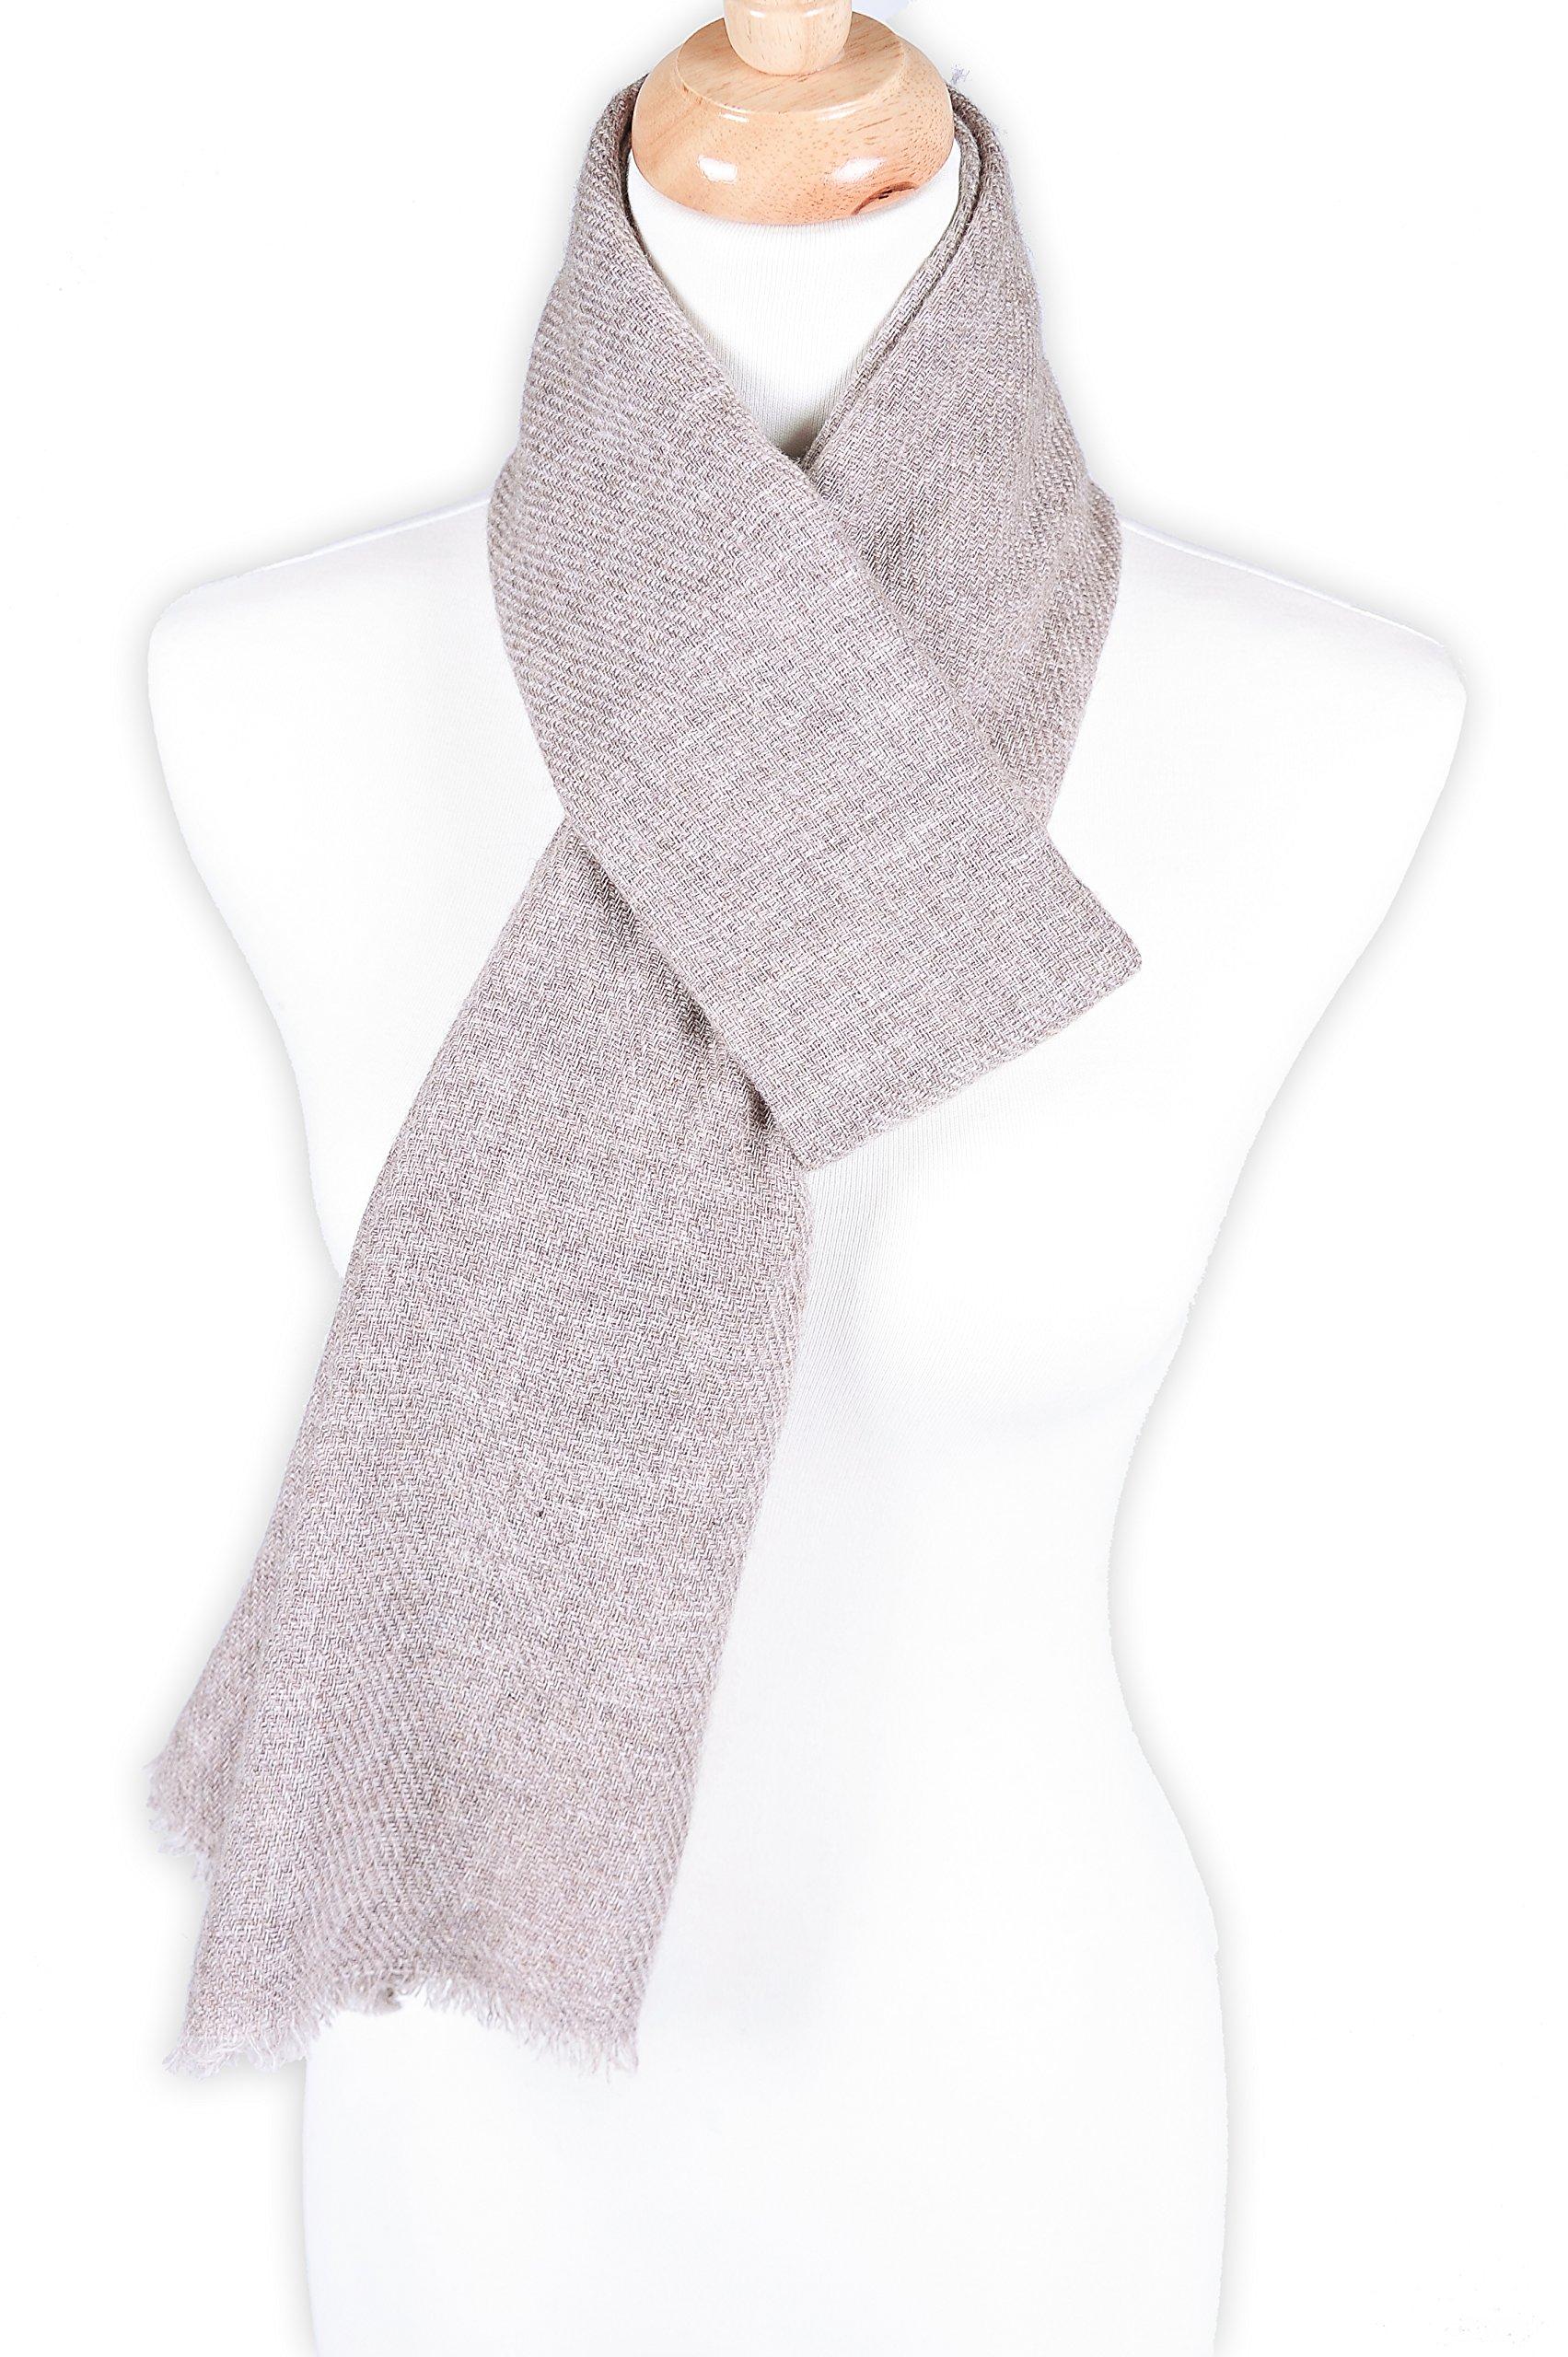 Zentopia classic 100% Grade A cashmere handmade scarf narrow cut light weight (Khaki) by Zentopia (Image #1)